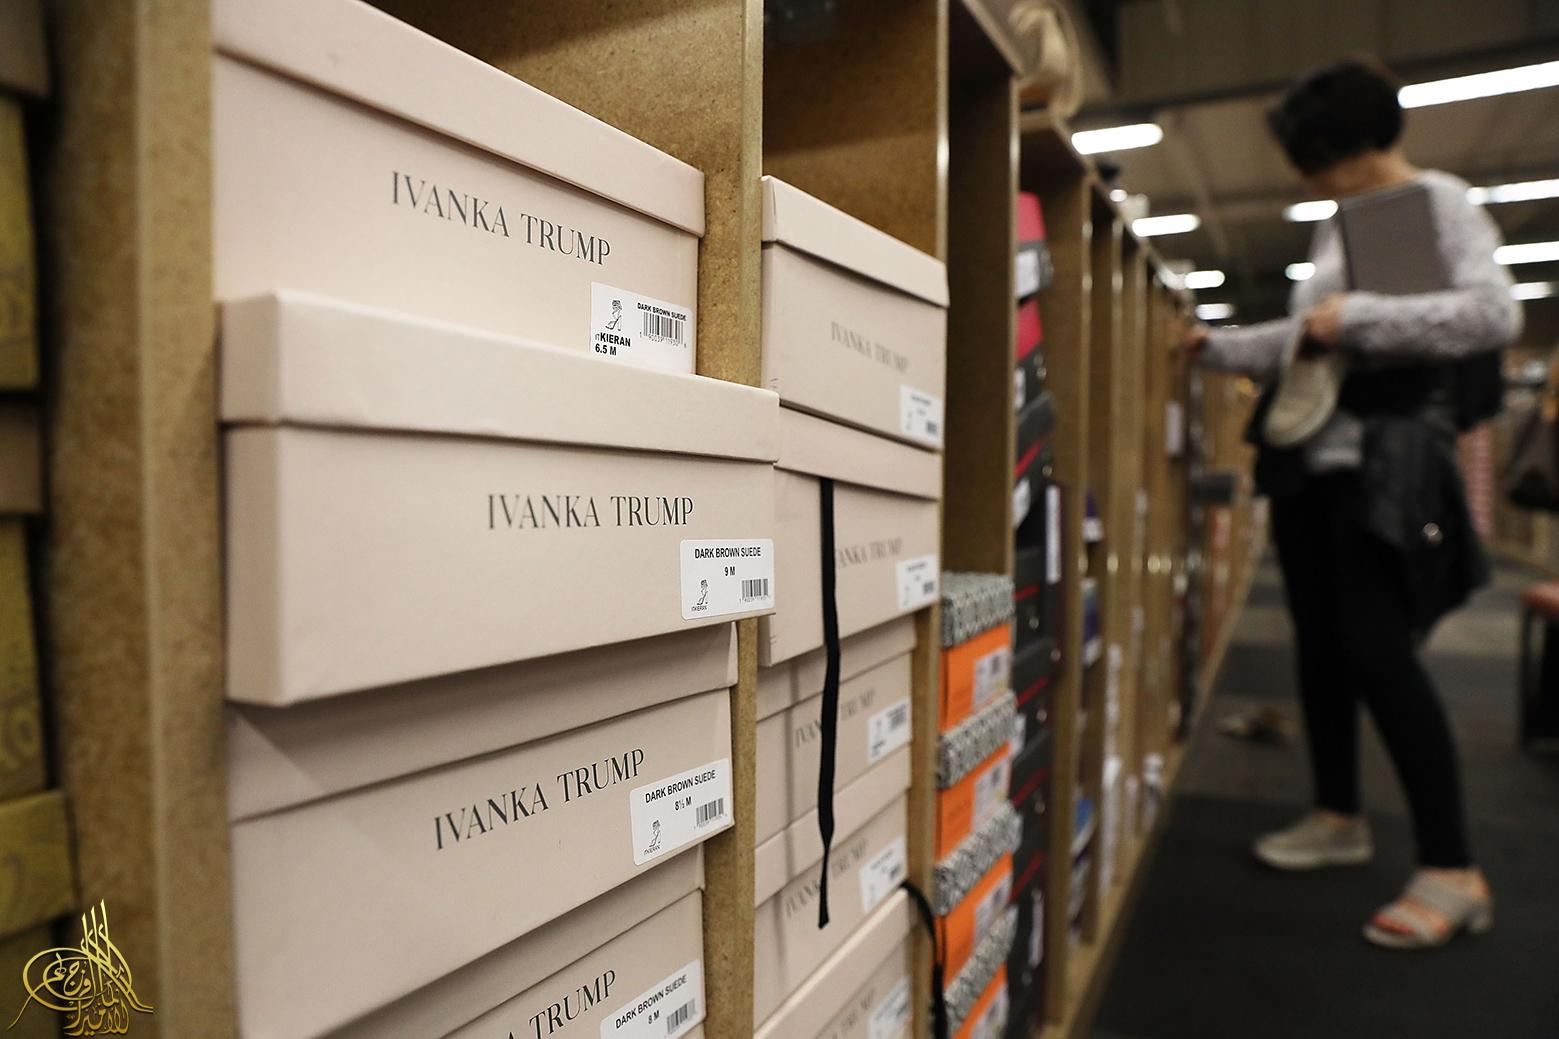 3206cd3bca497 إختطاف 3 يحققون في انتهاكات مصنع أحذية إيفانكا ترامب